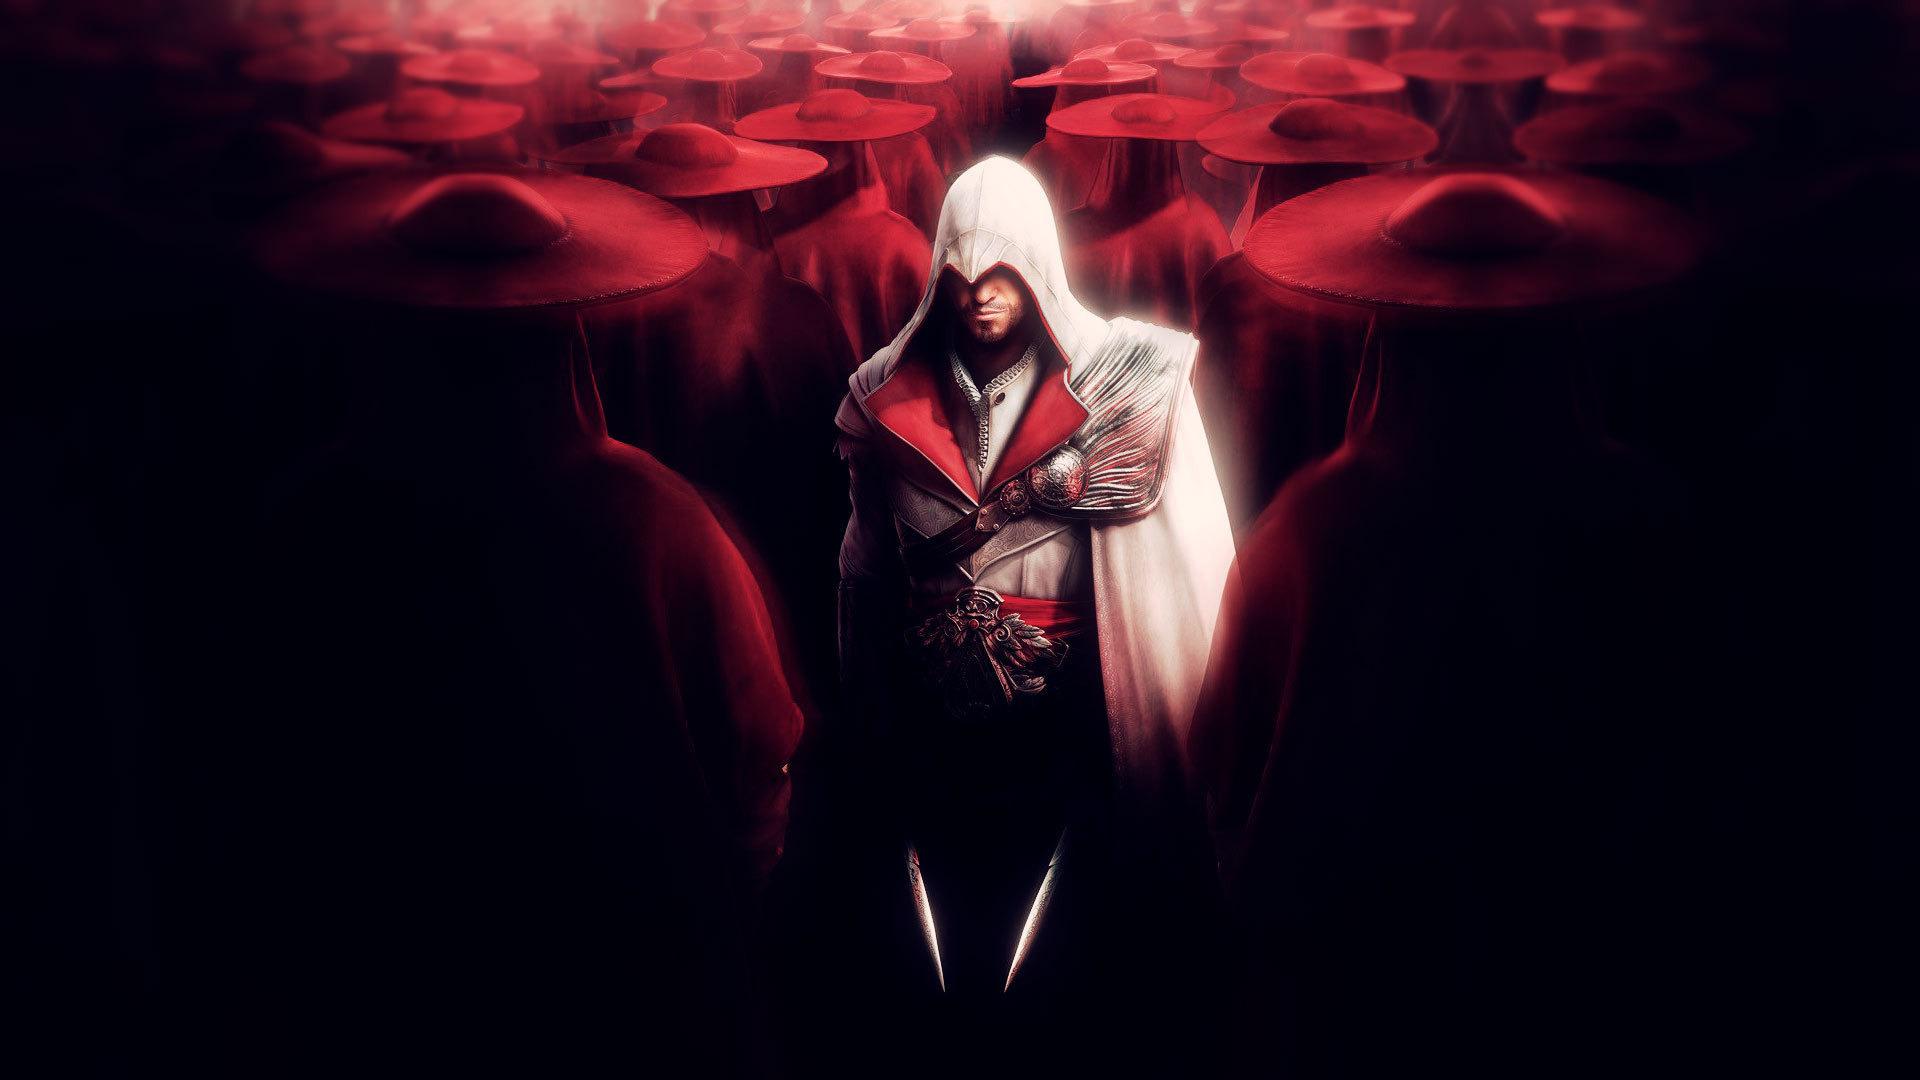 Assassins Creed Brotherhood Wallpaper: 52 Assassin's Creed: Brotherhood HD Wallpapers